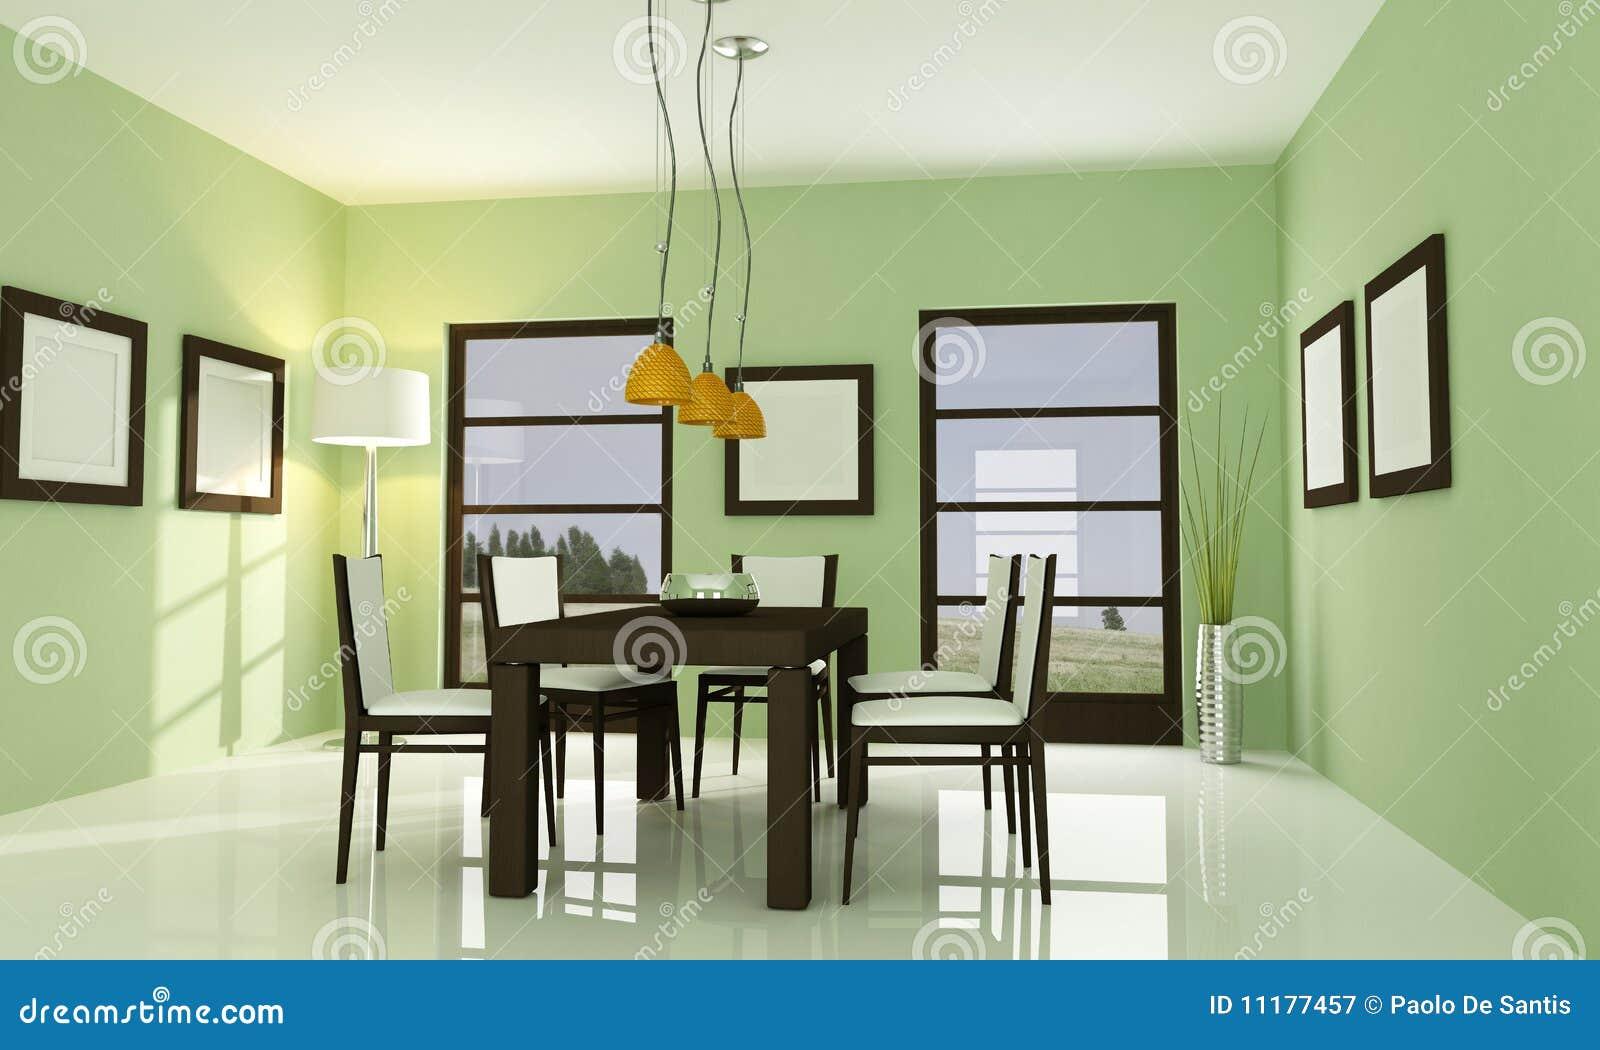 Sala Da Pranzo Verde Contemporanea Fotografia Stock Libera Da Diritti  #B78614 1300 870 Sala Da Pranzo Arte Contemporanea